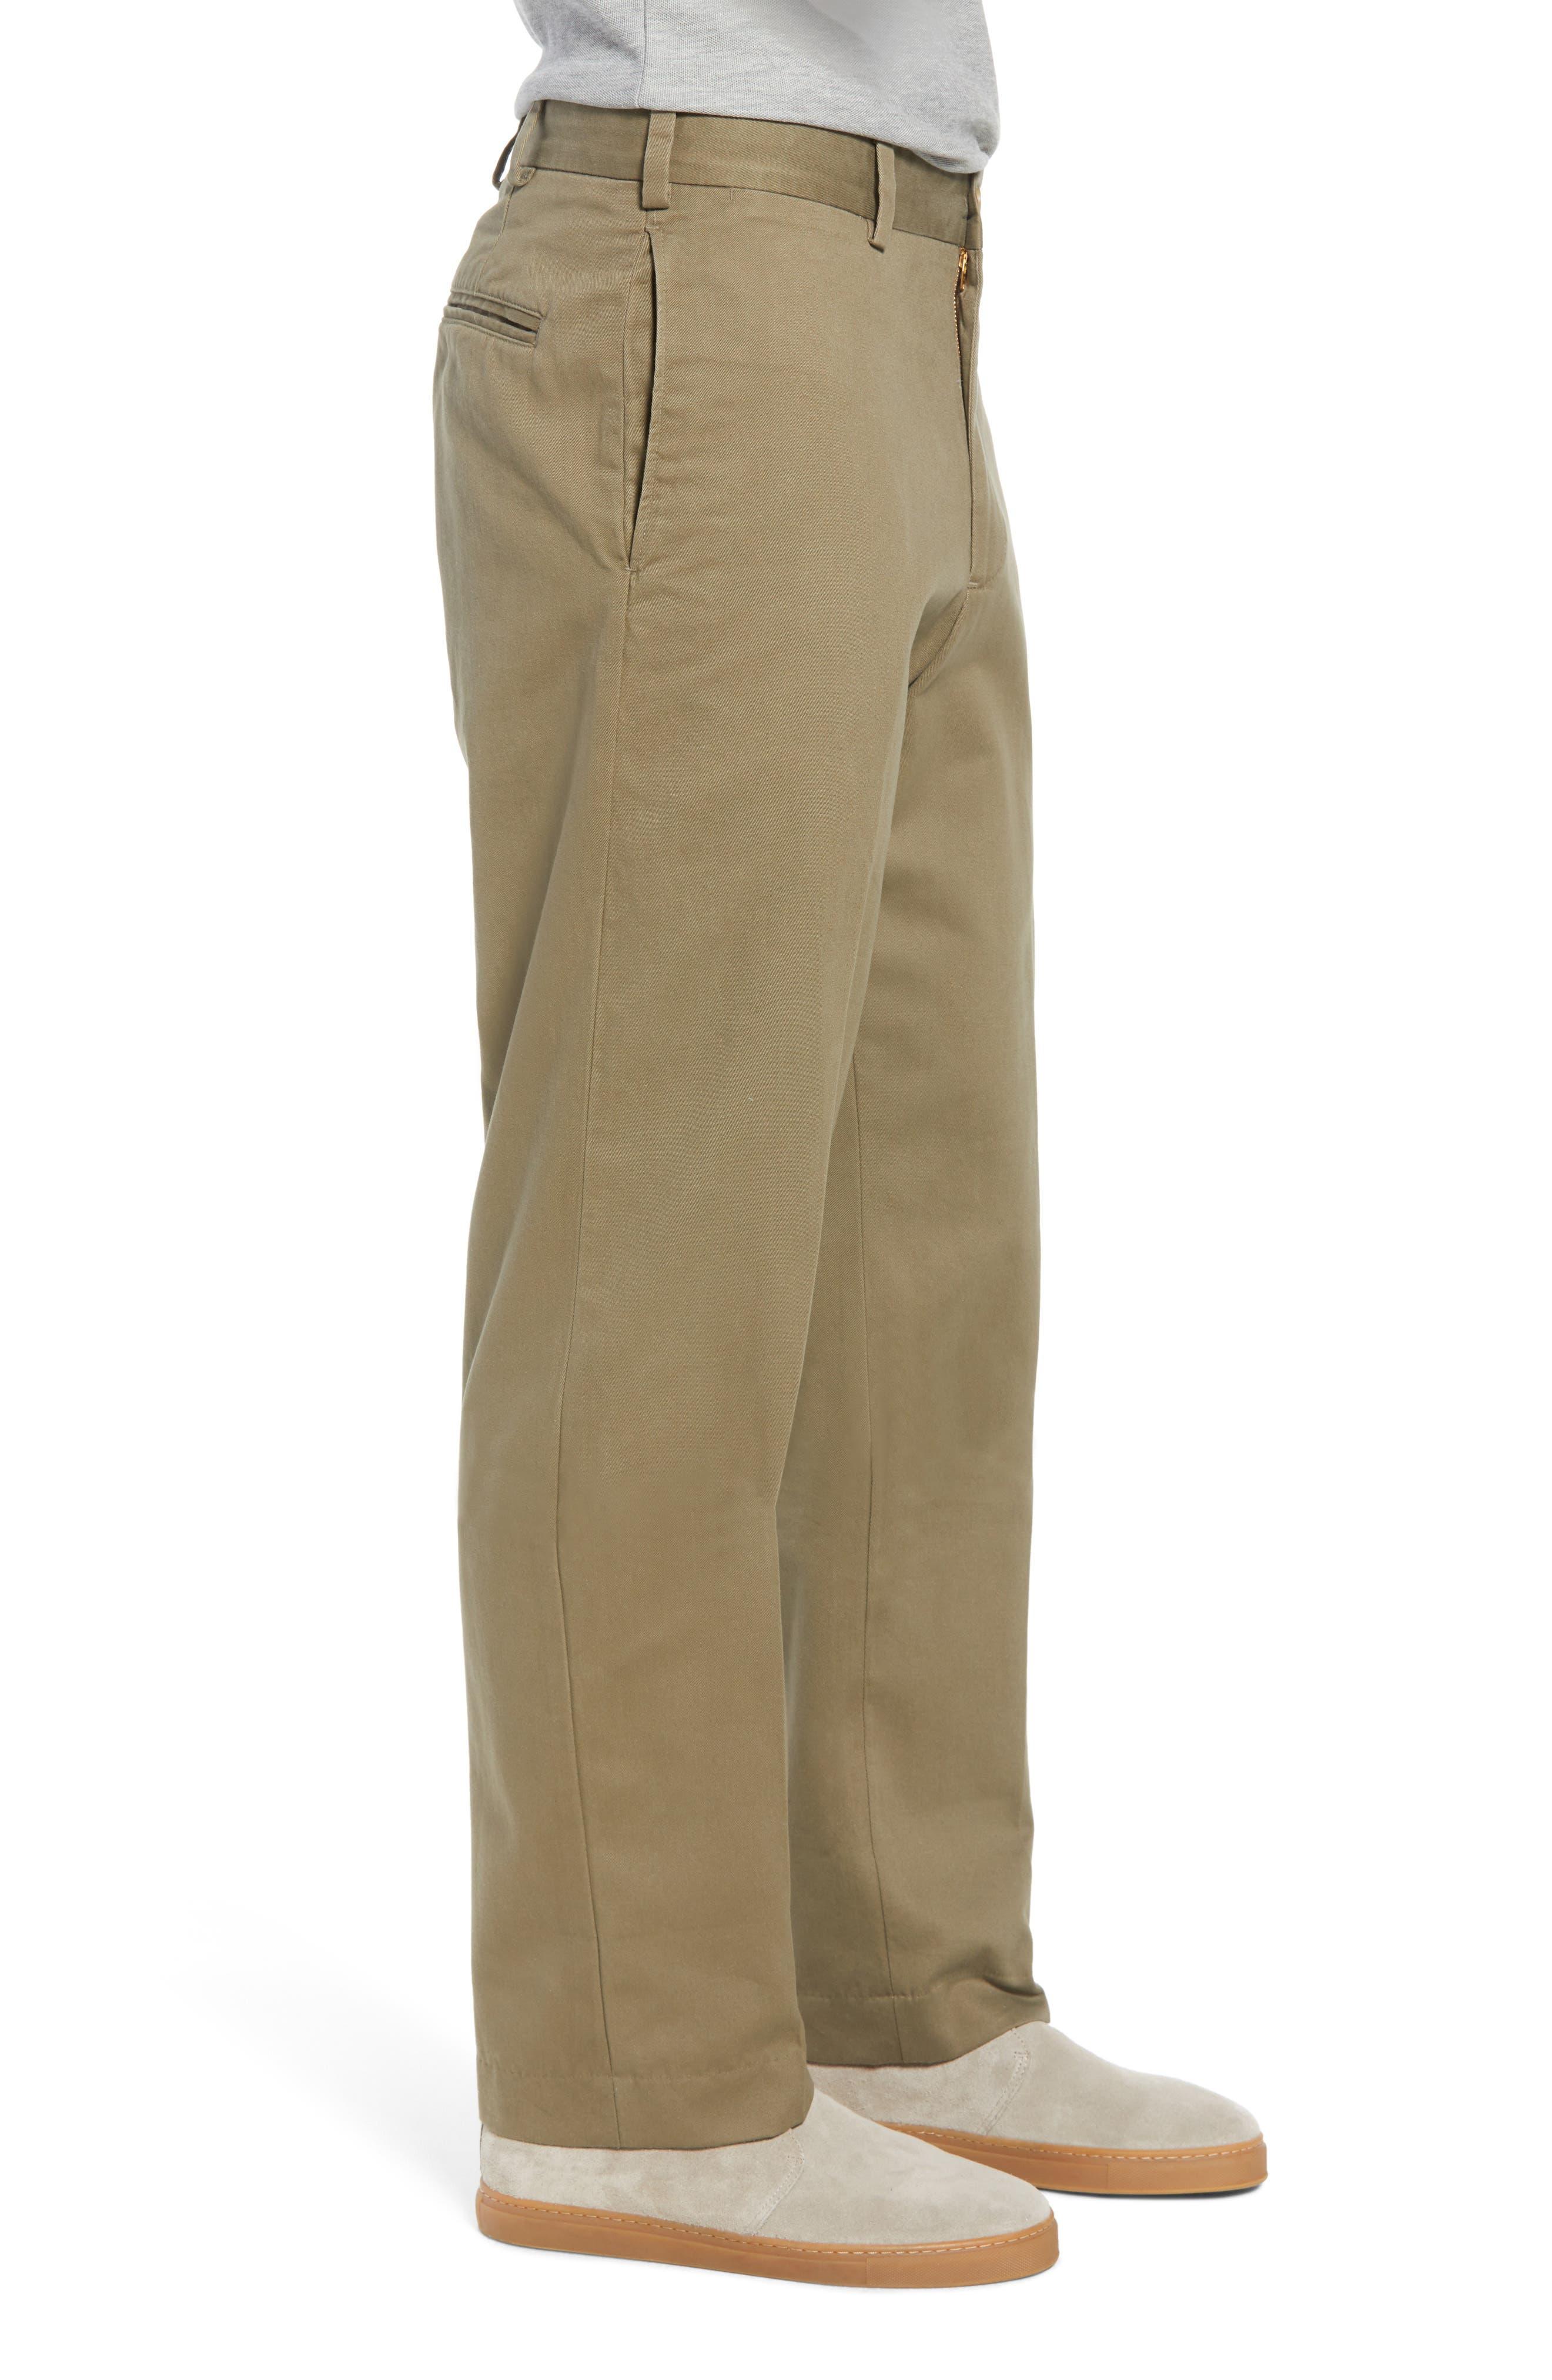 M2 Classic Fit Flat Front Vintage Twill Pants,                             Alternate thumbnail 3, color,                             330